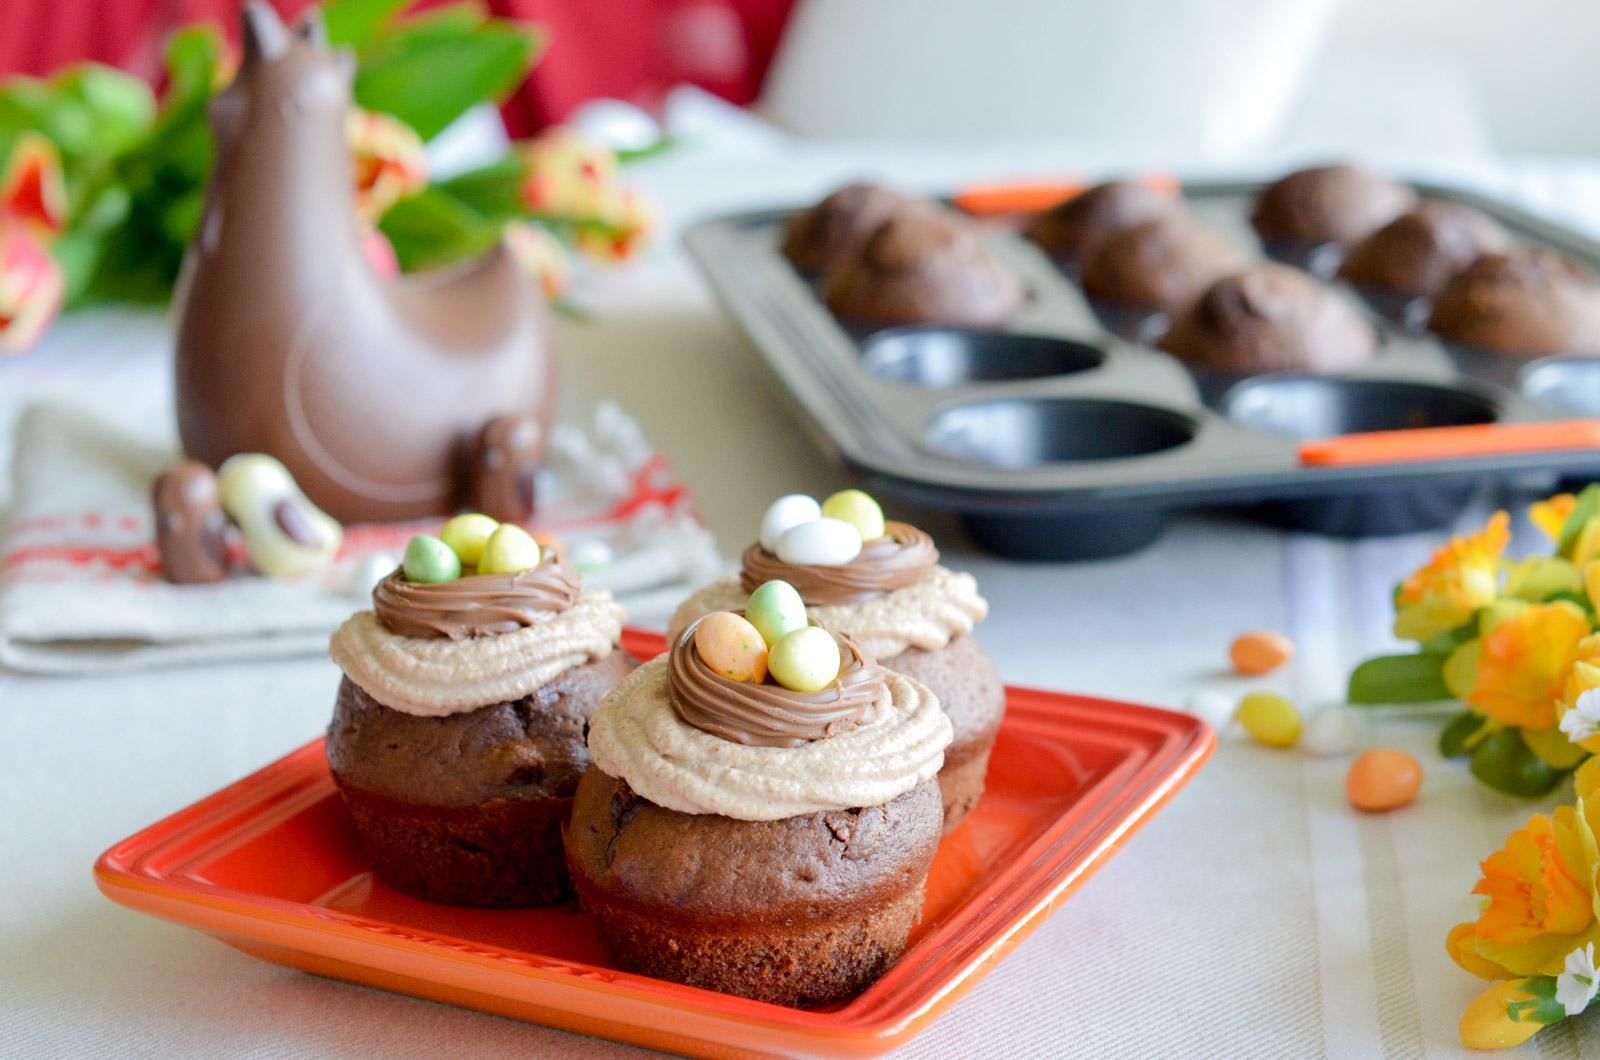 Muffins Tout Choco Praline Creuset Cluizel (4 Sur 10)